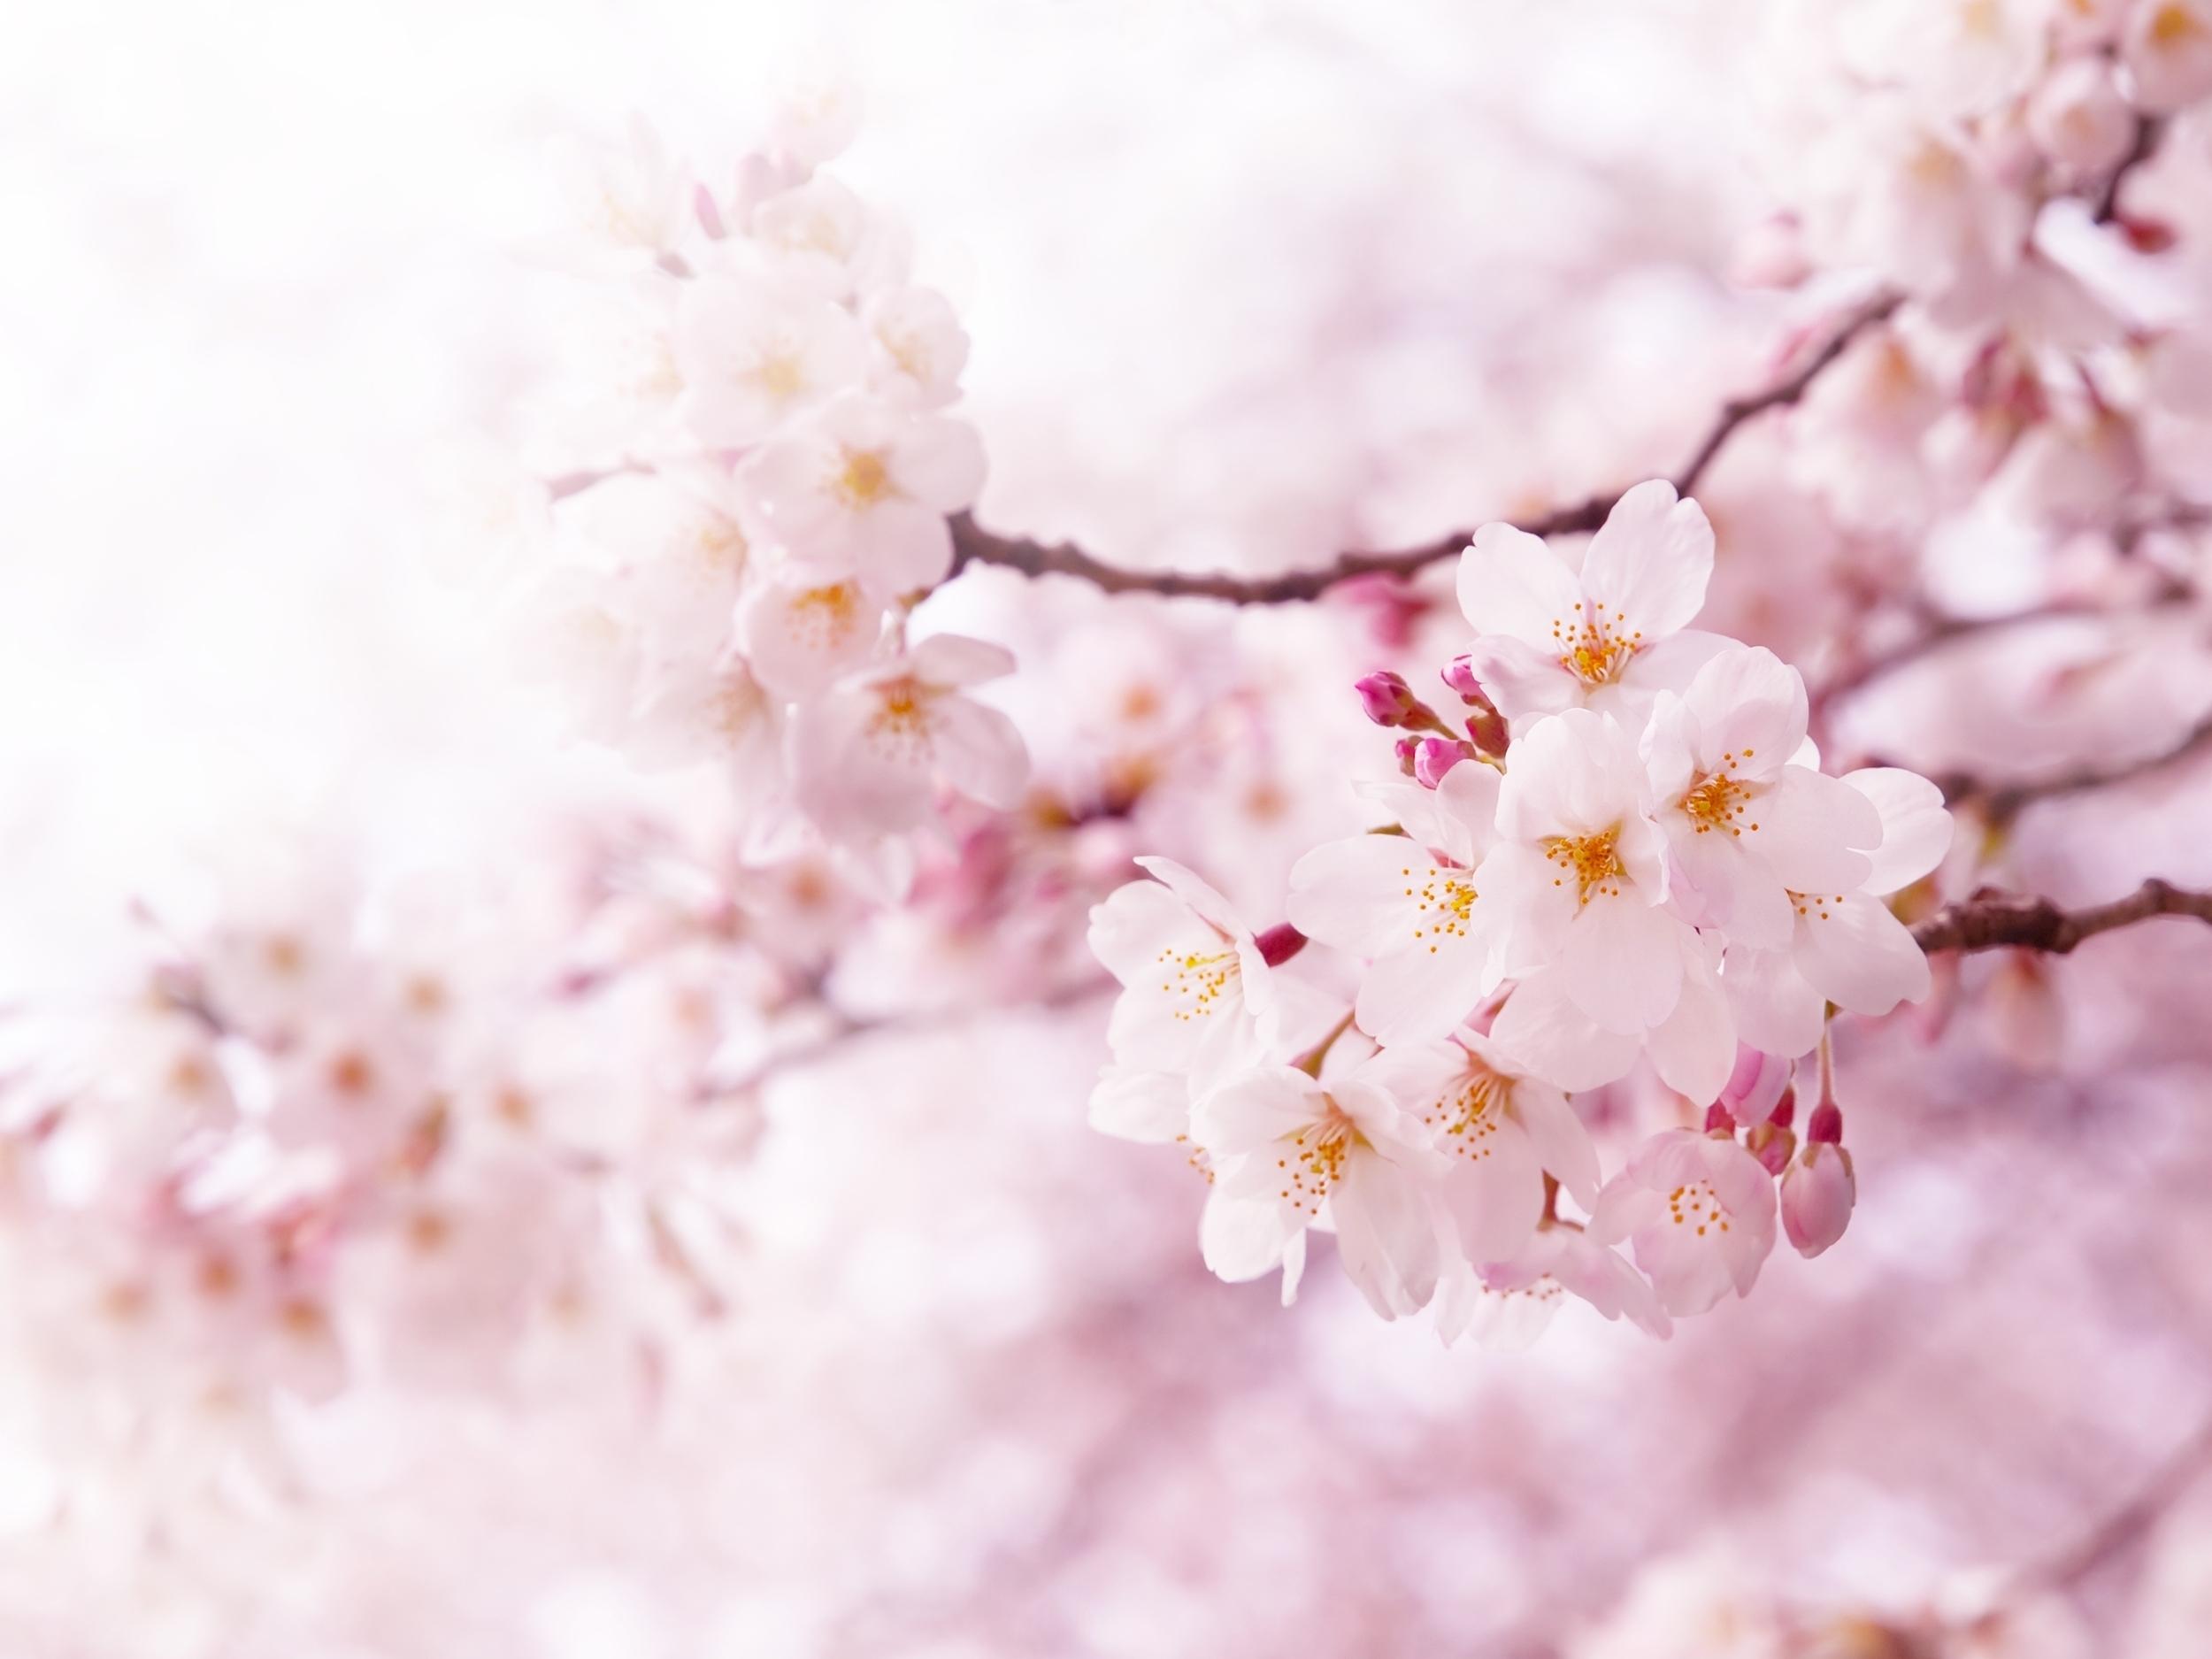 Bigstock Cherry Blossoms In Full Bloom 19431392